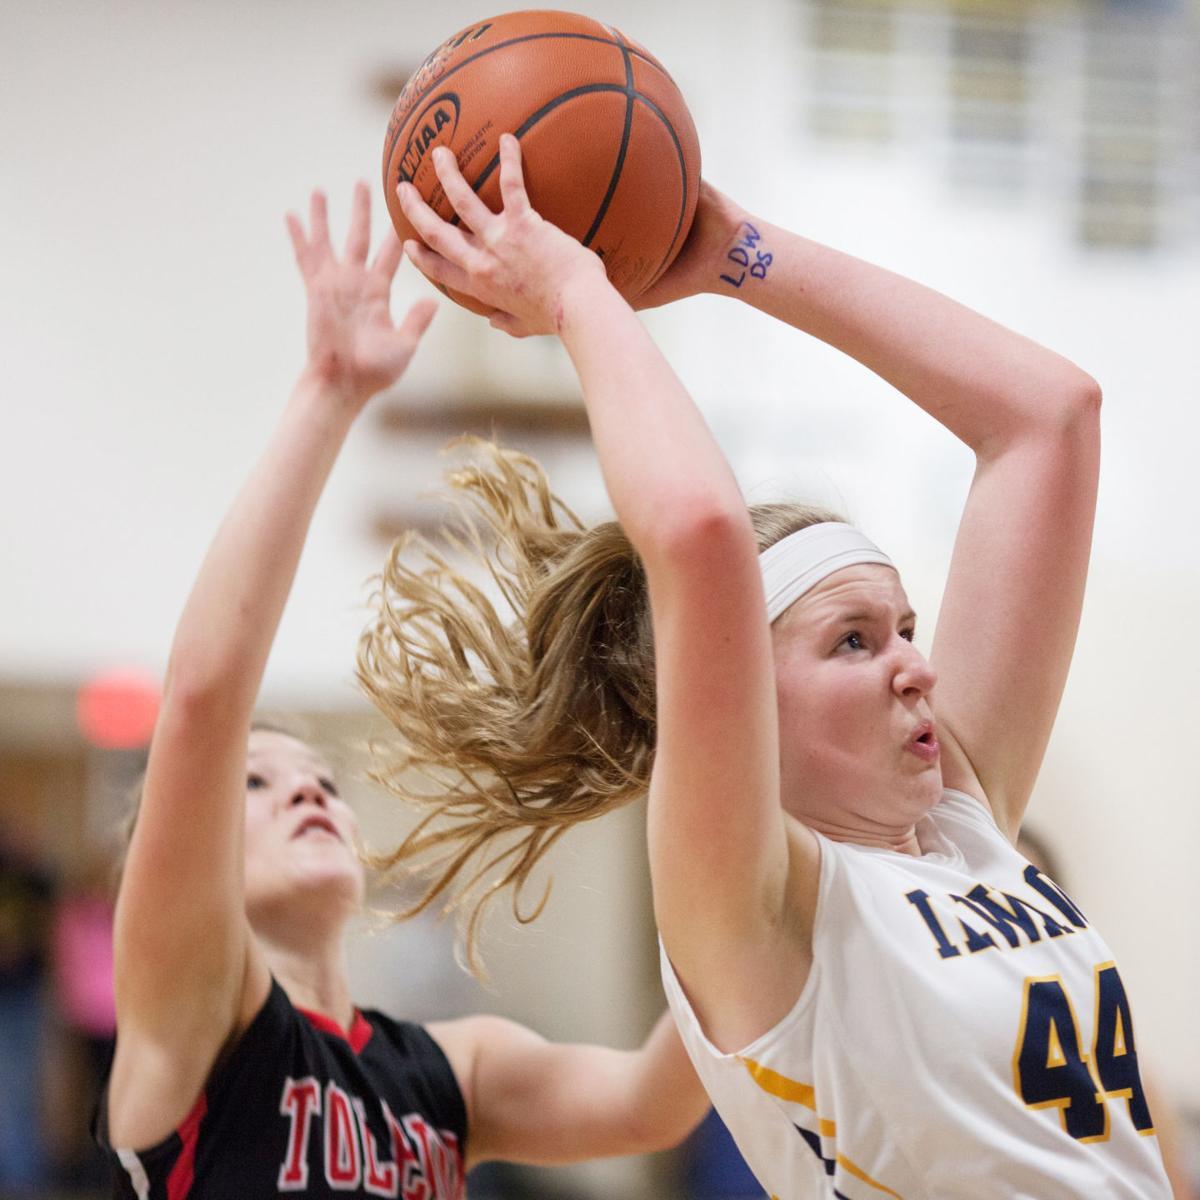 IHS girls leap to huge win over Toledo